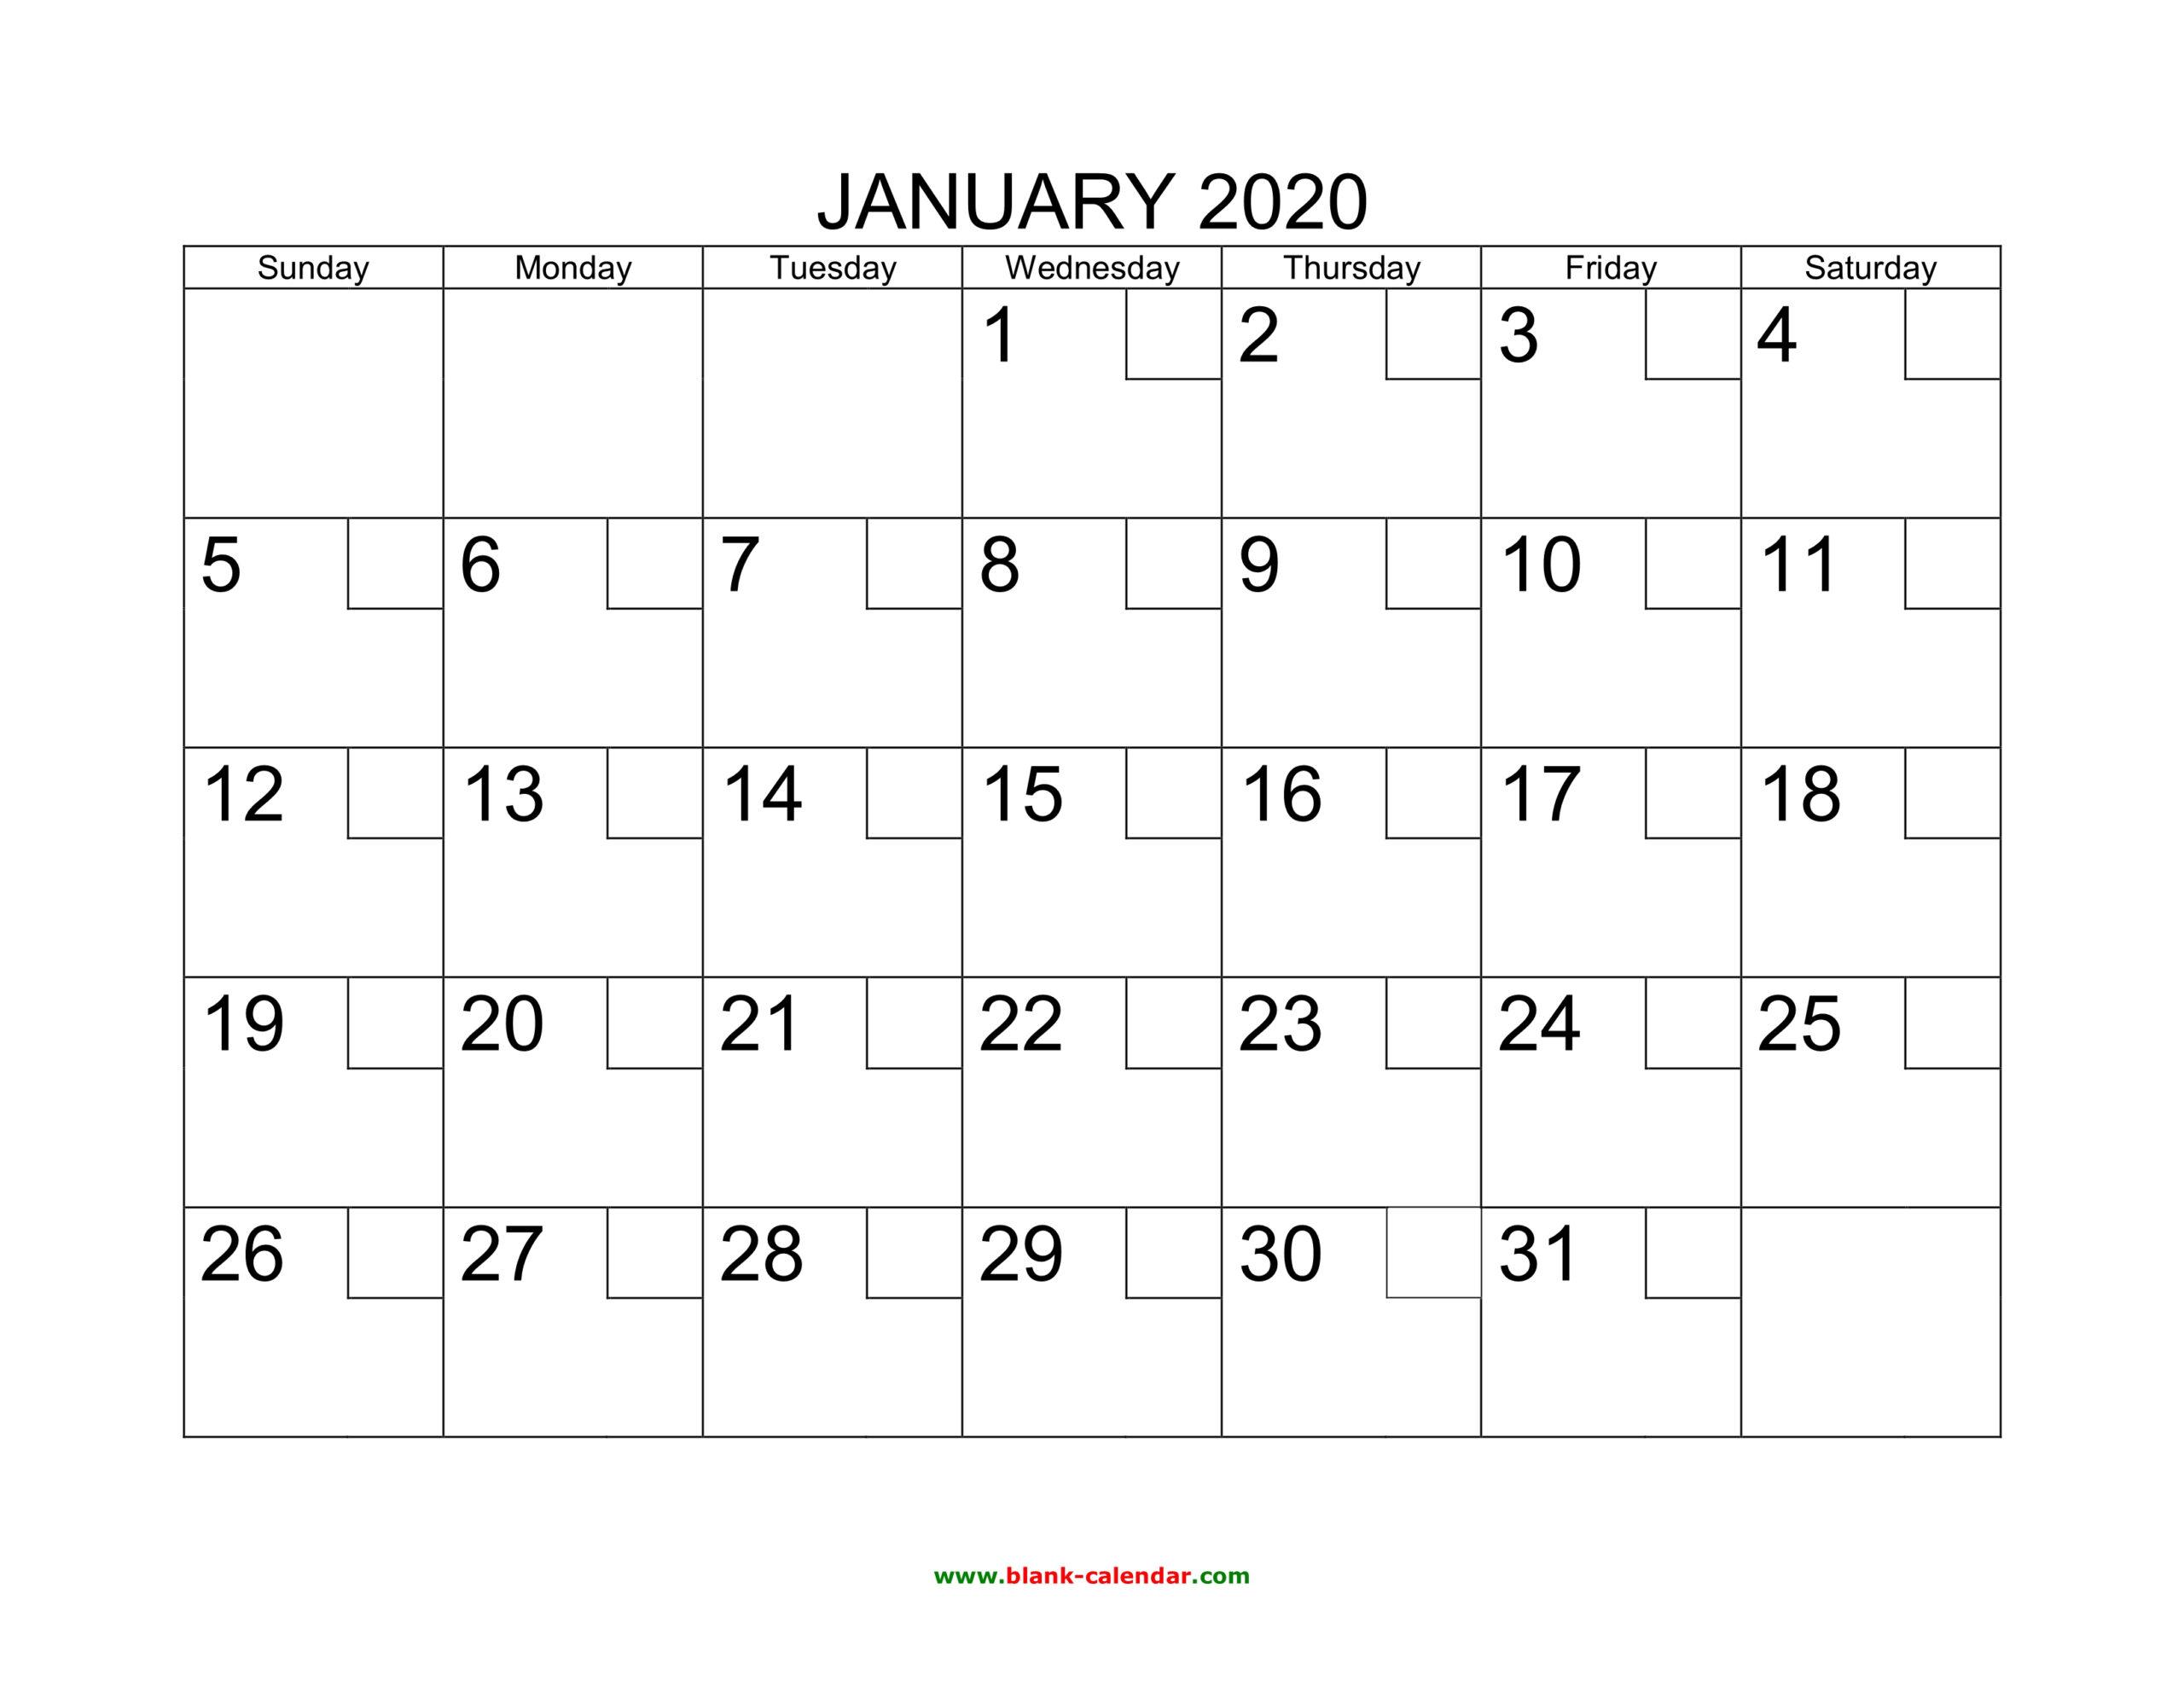 Monthly Print Calendars Templates 2020 Multiple Months Per regarding Multi Month Calendar Template